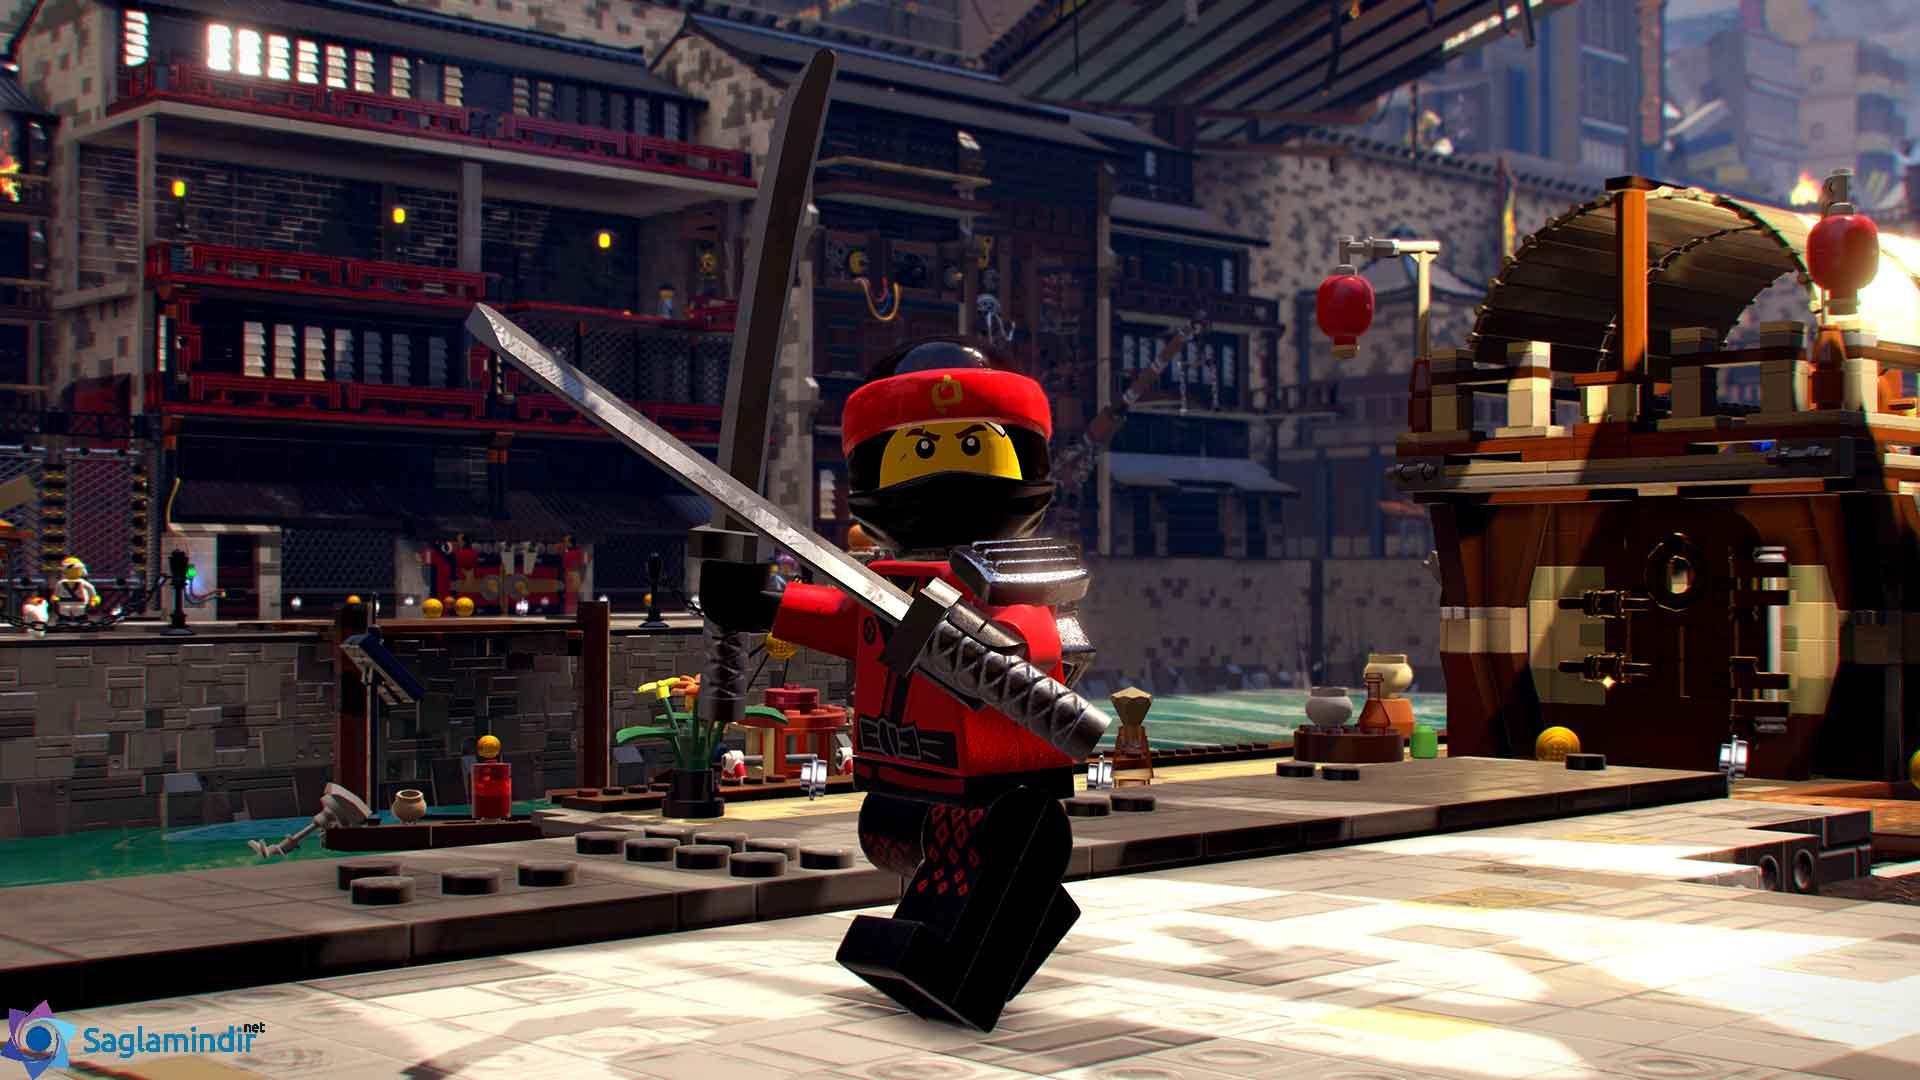 The-Lego-Ninjago-Movie-Video-Game-saglamindir